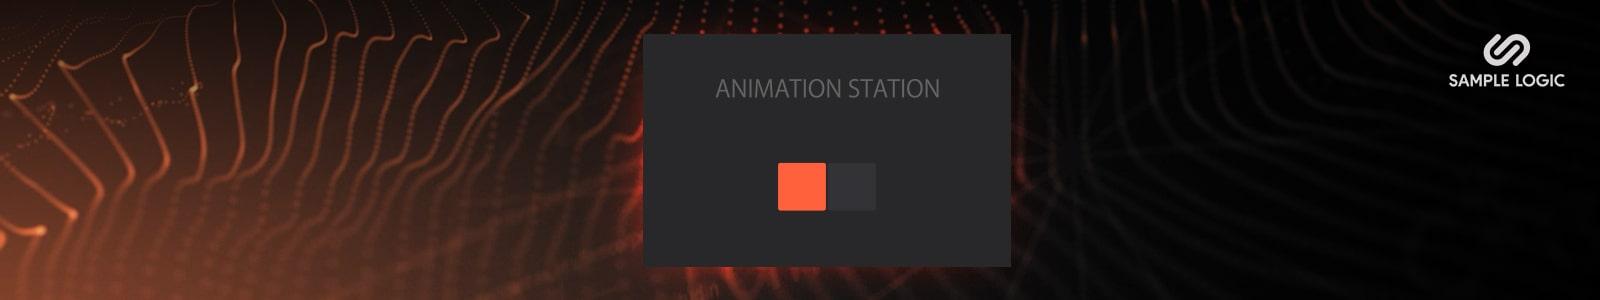 animation station by sample logic